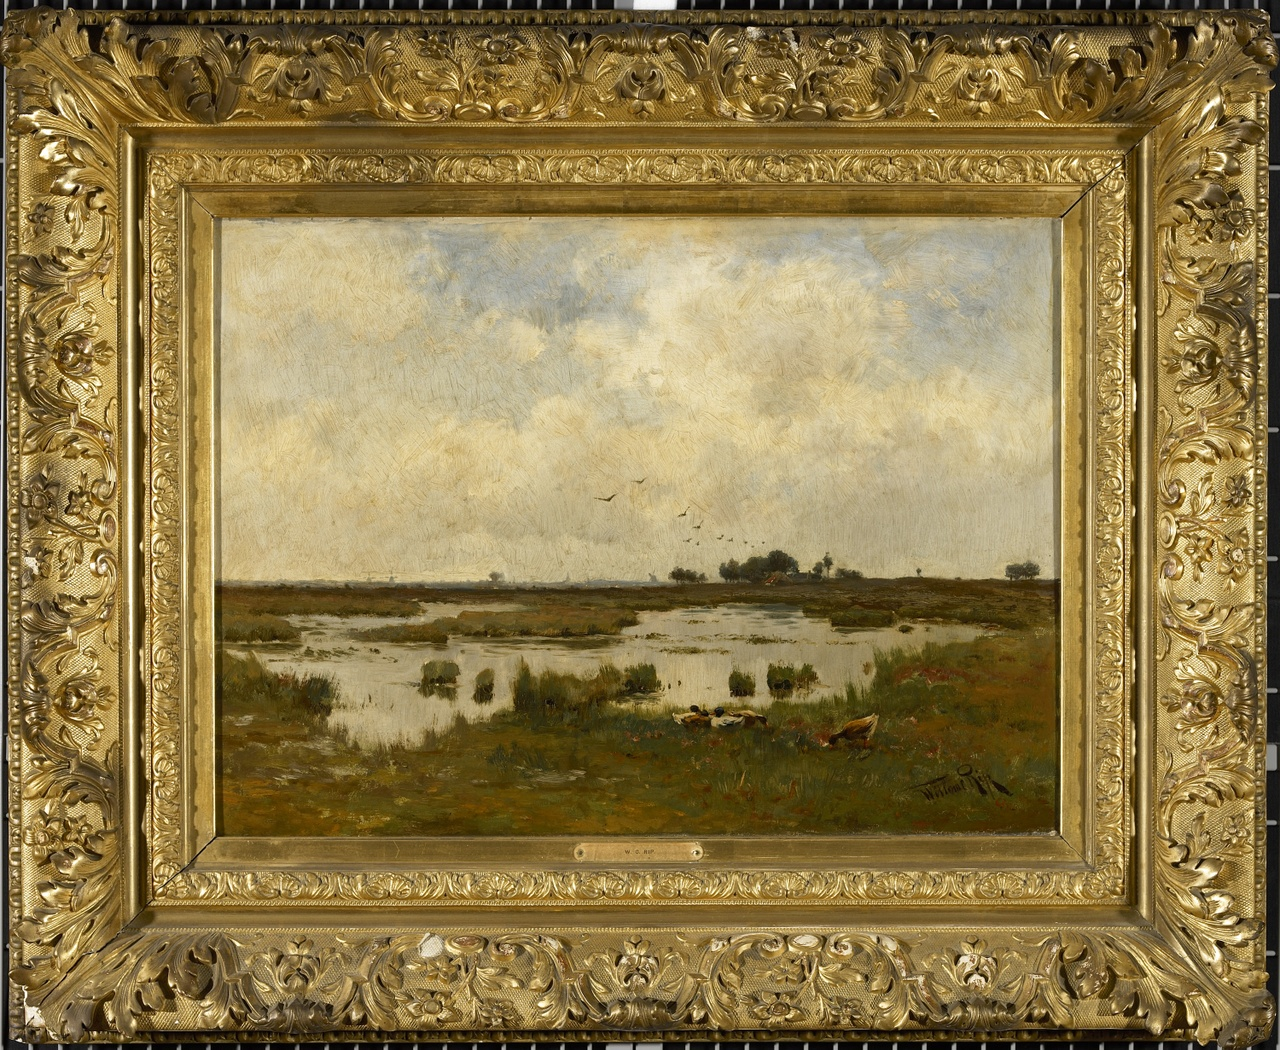 In de Peel (Limburg), Willem Cornelis Rip